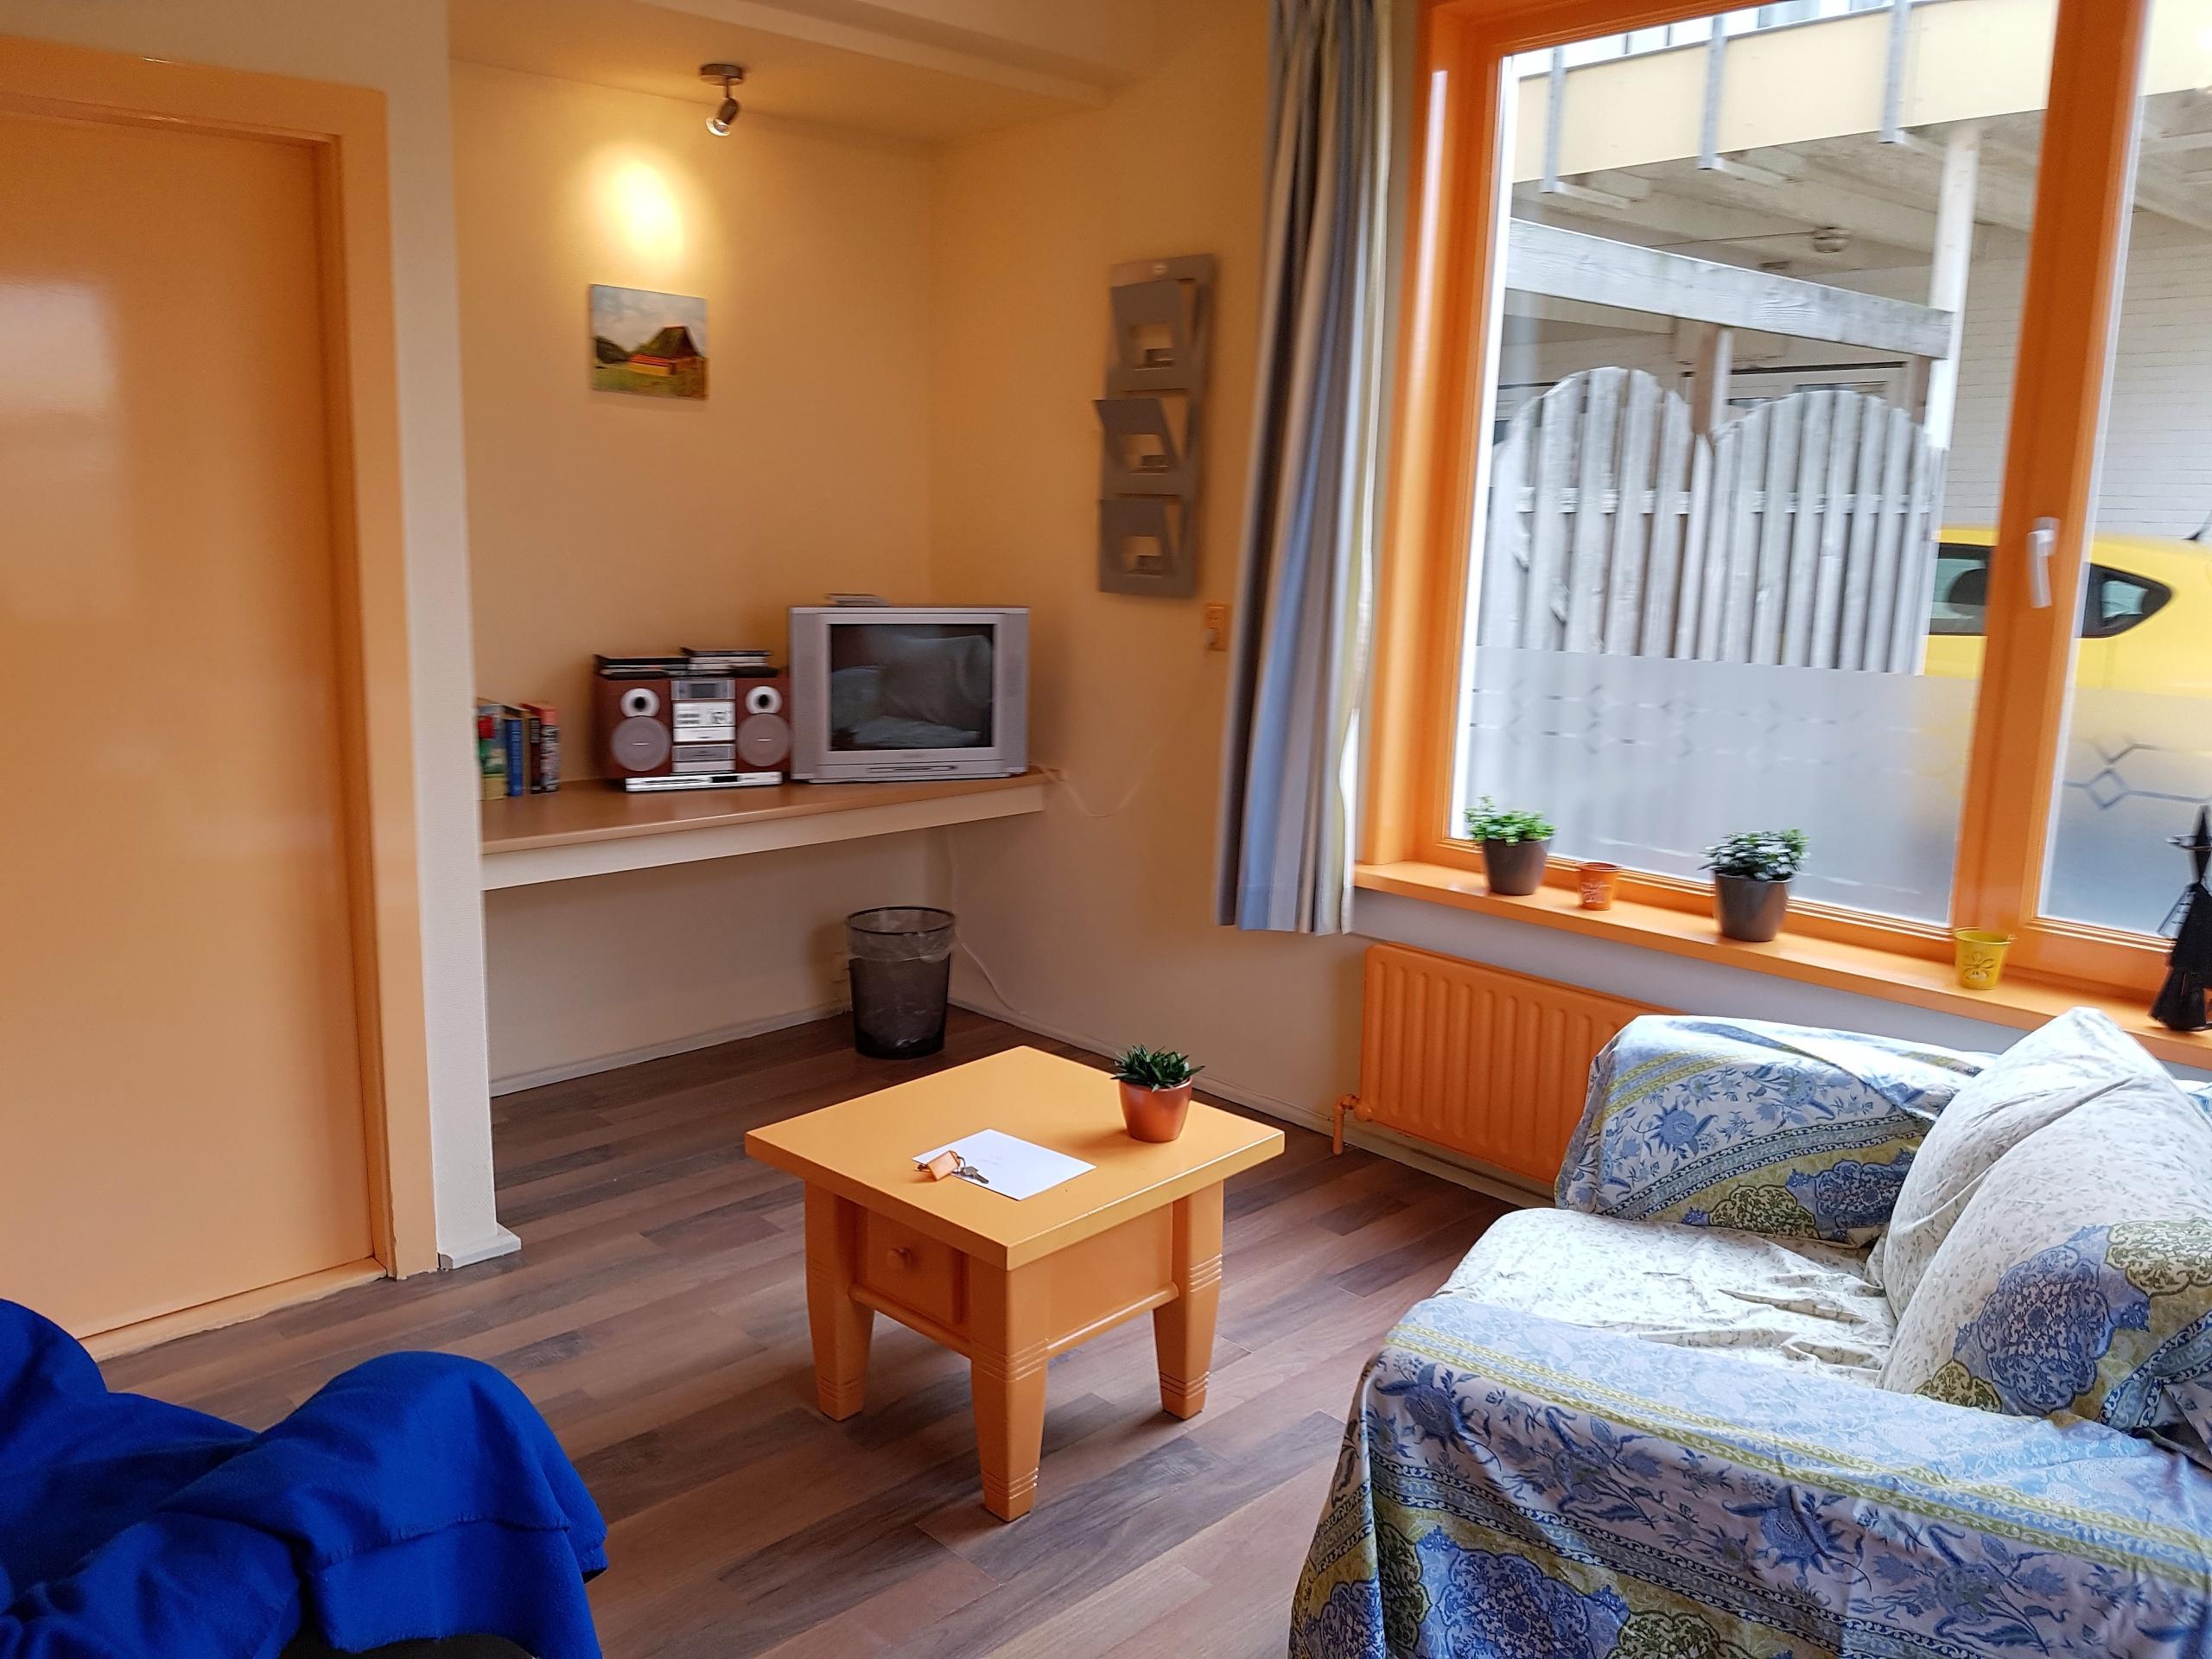 Basic apartment near the shops and dunes of De Koog